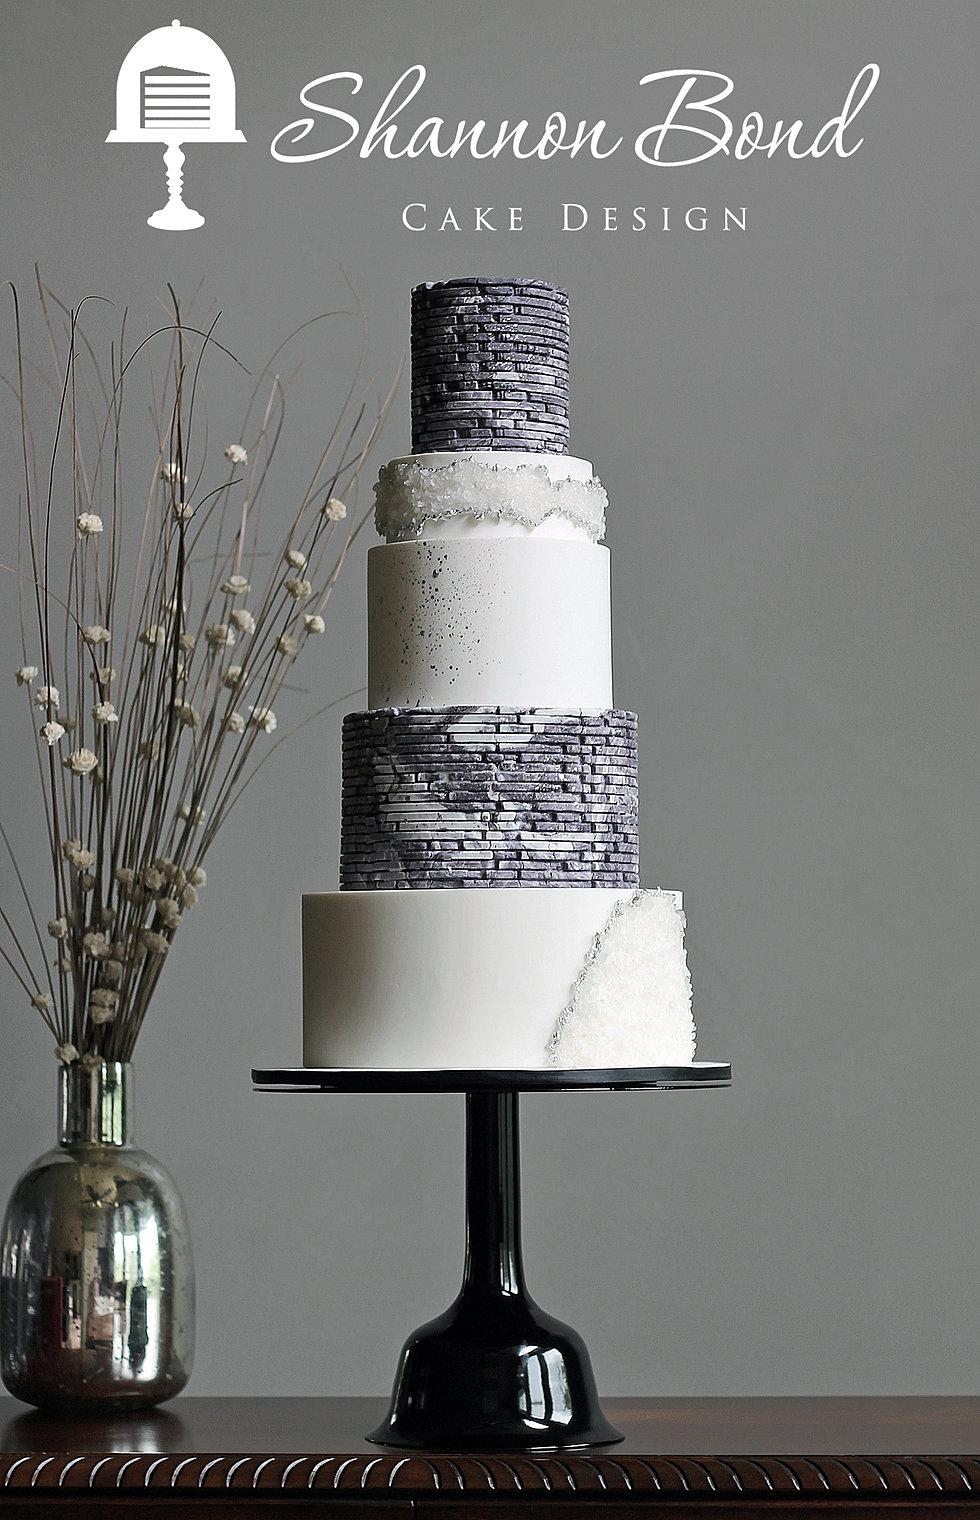 Shannon Bond Cake Design | Kansas City wedding and custom cakes ...